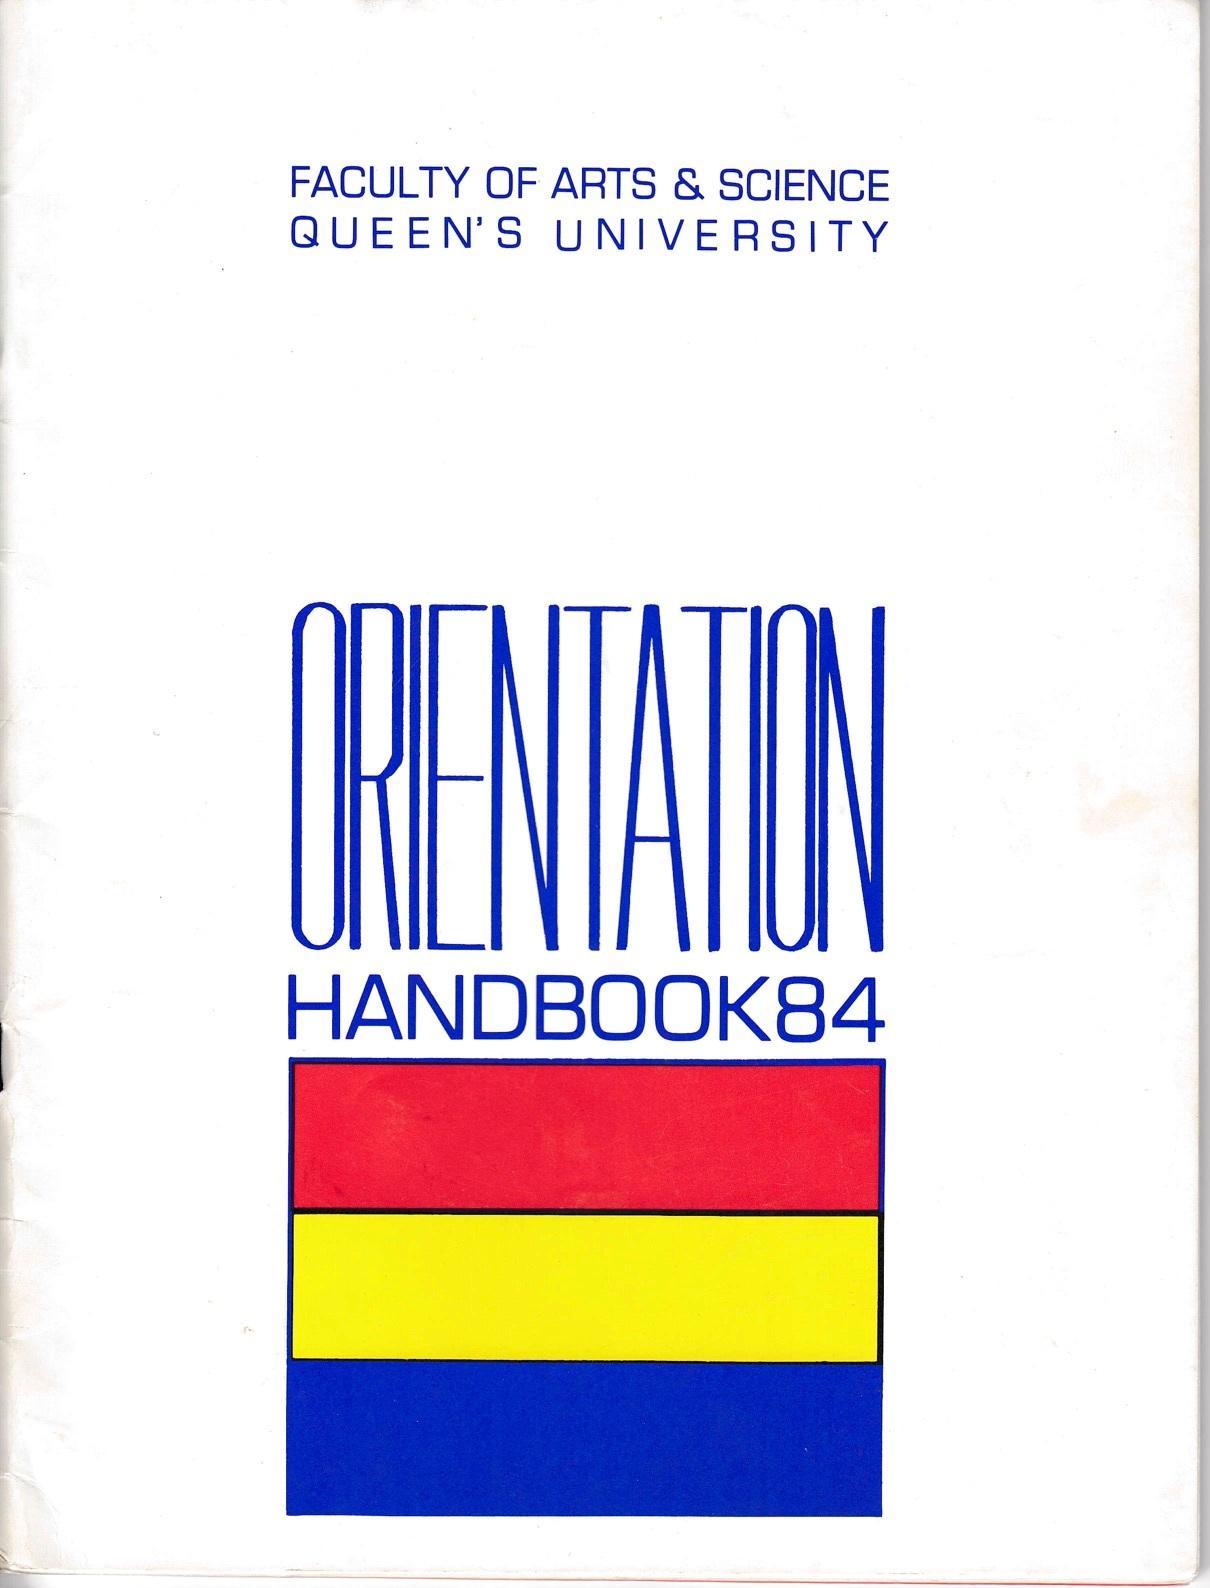 Orientation handbook cover 1984.jpg